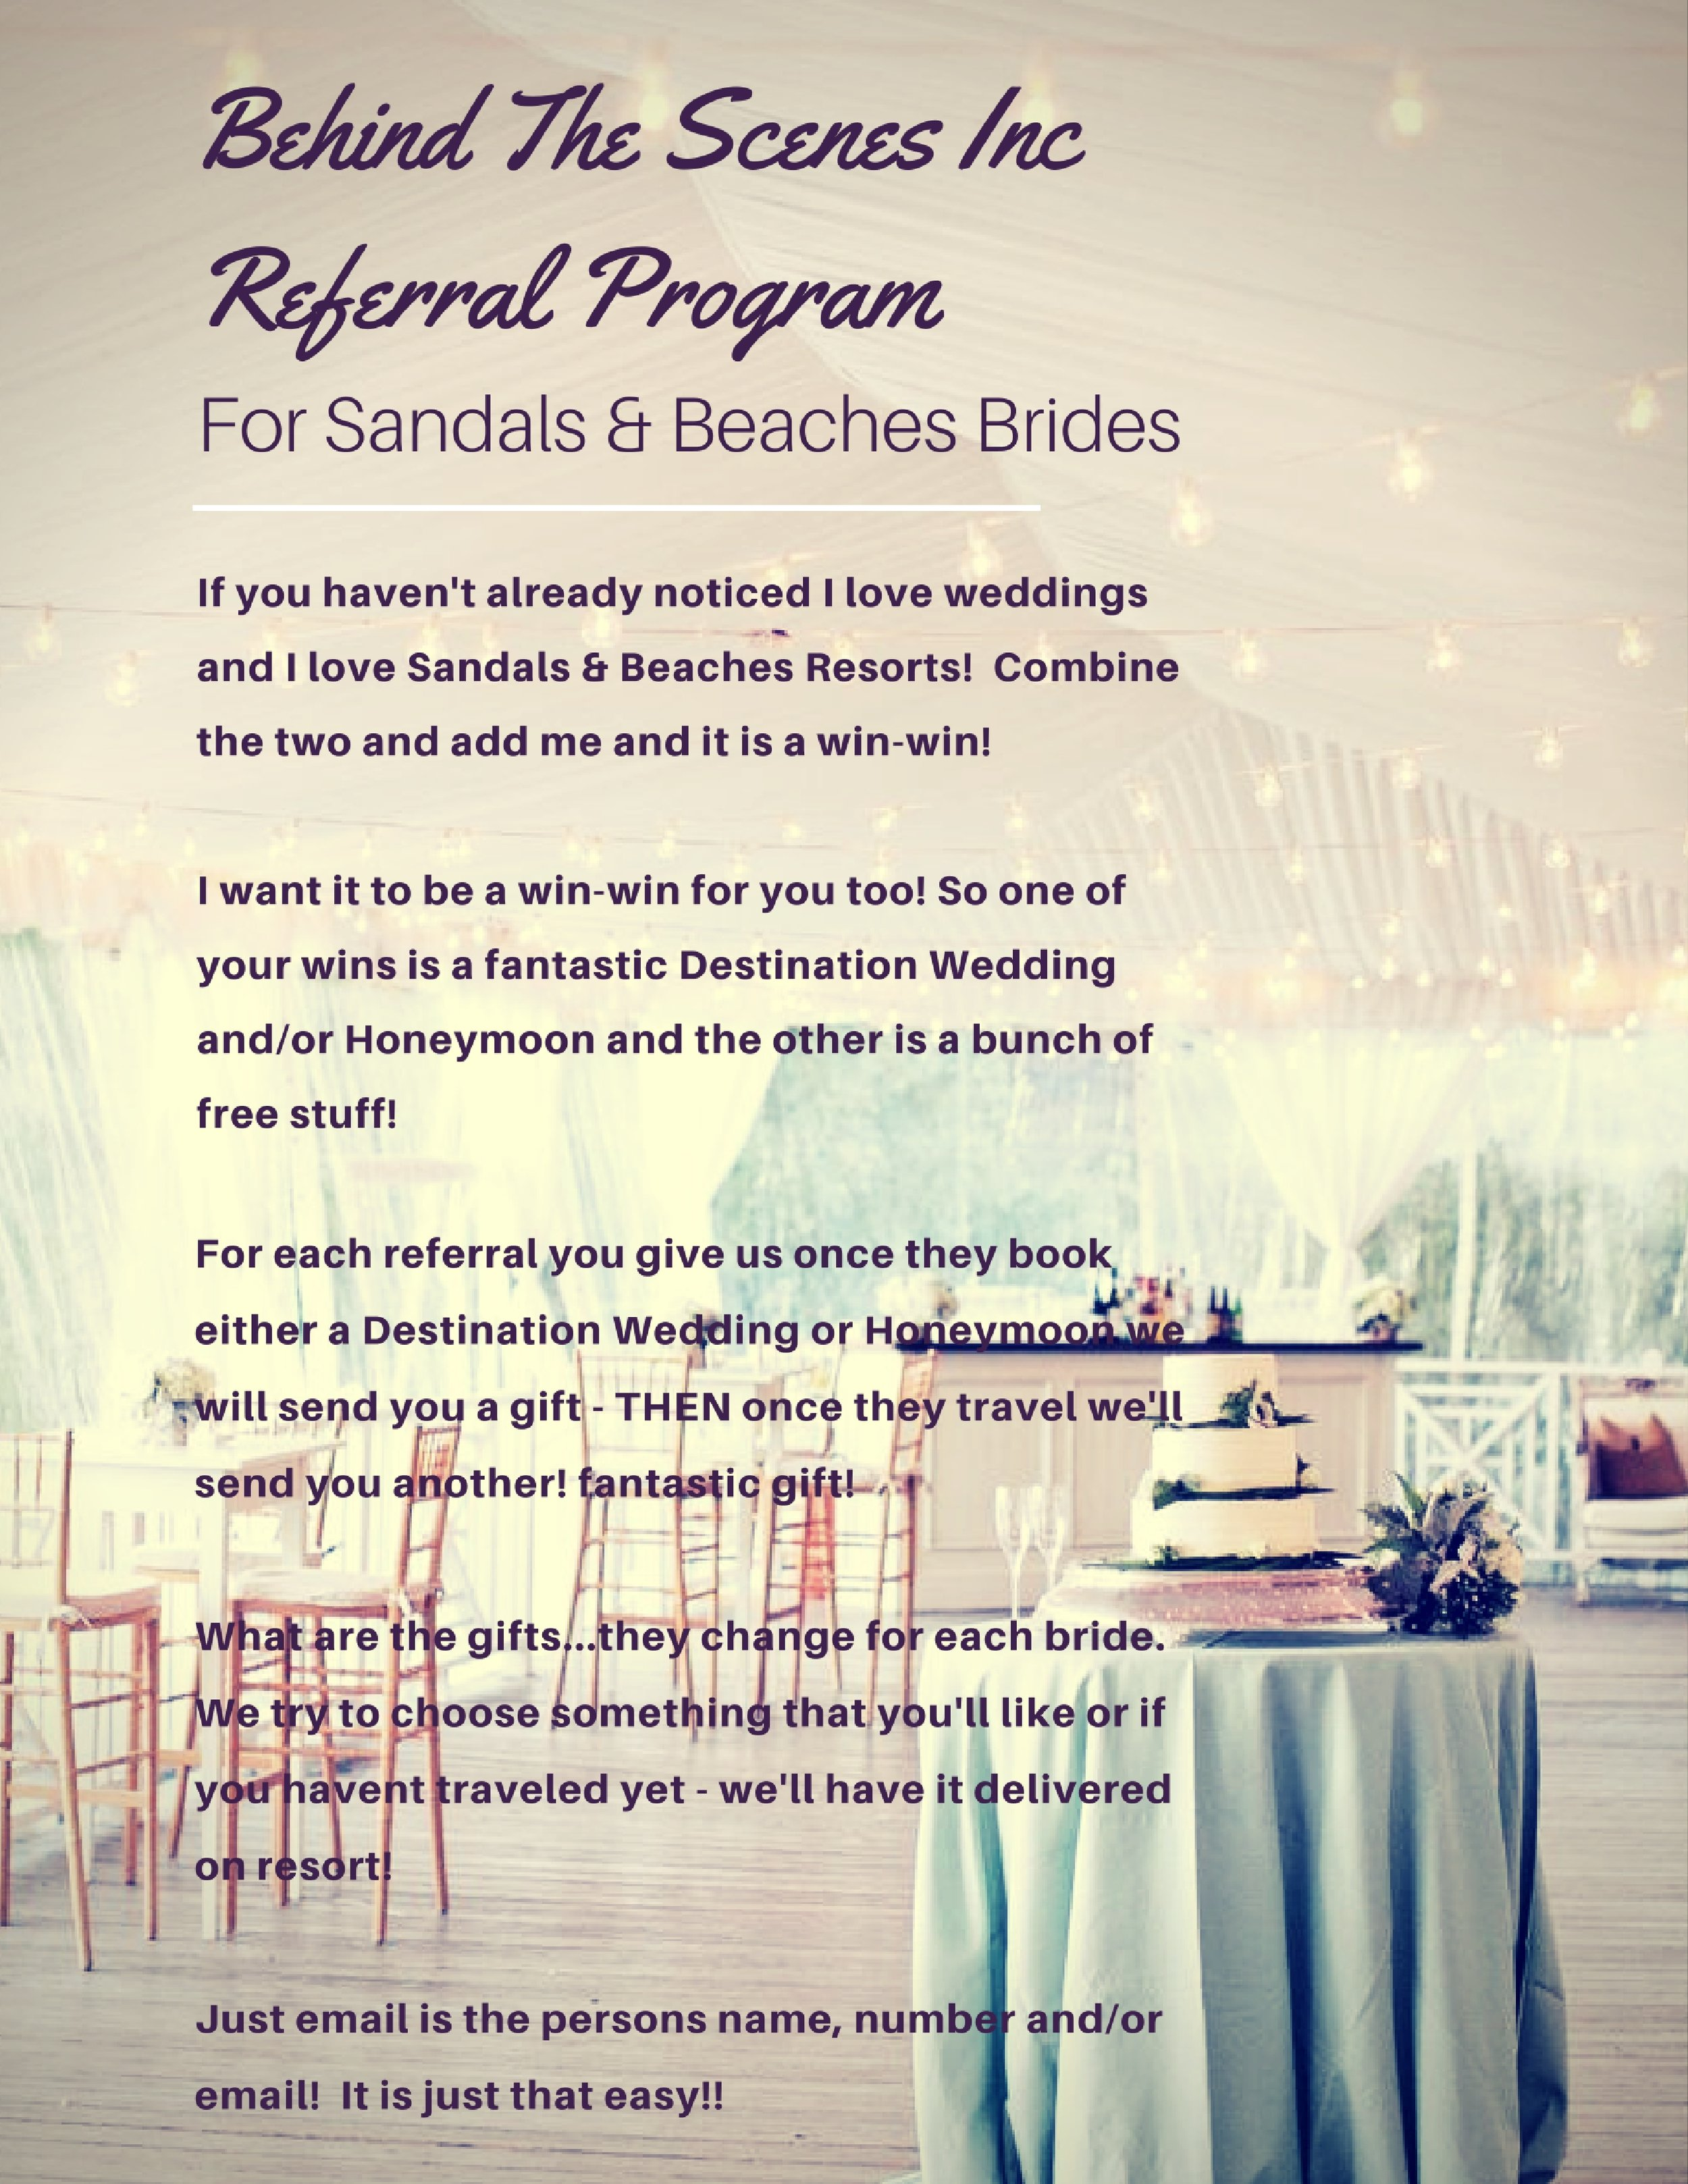 Referral Program - Sandals & Beaches Brides.jpg